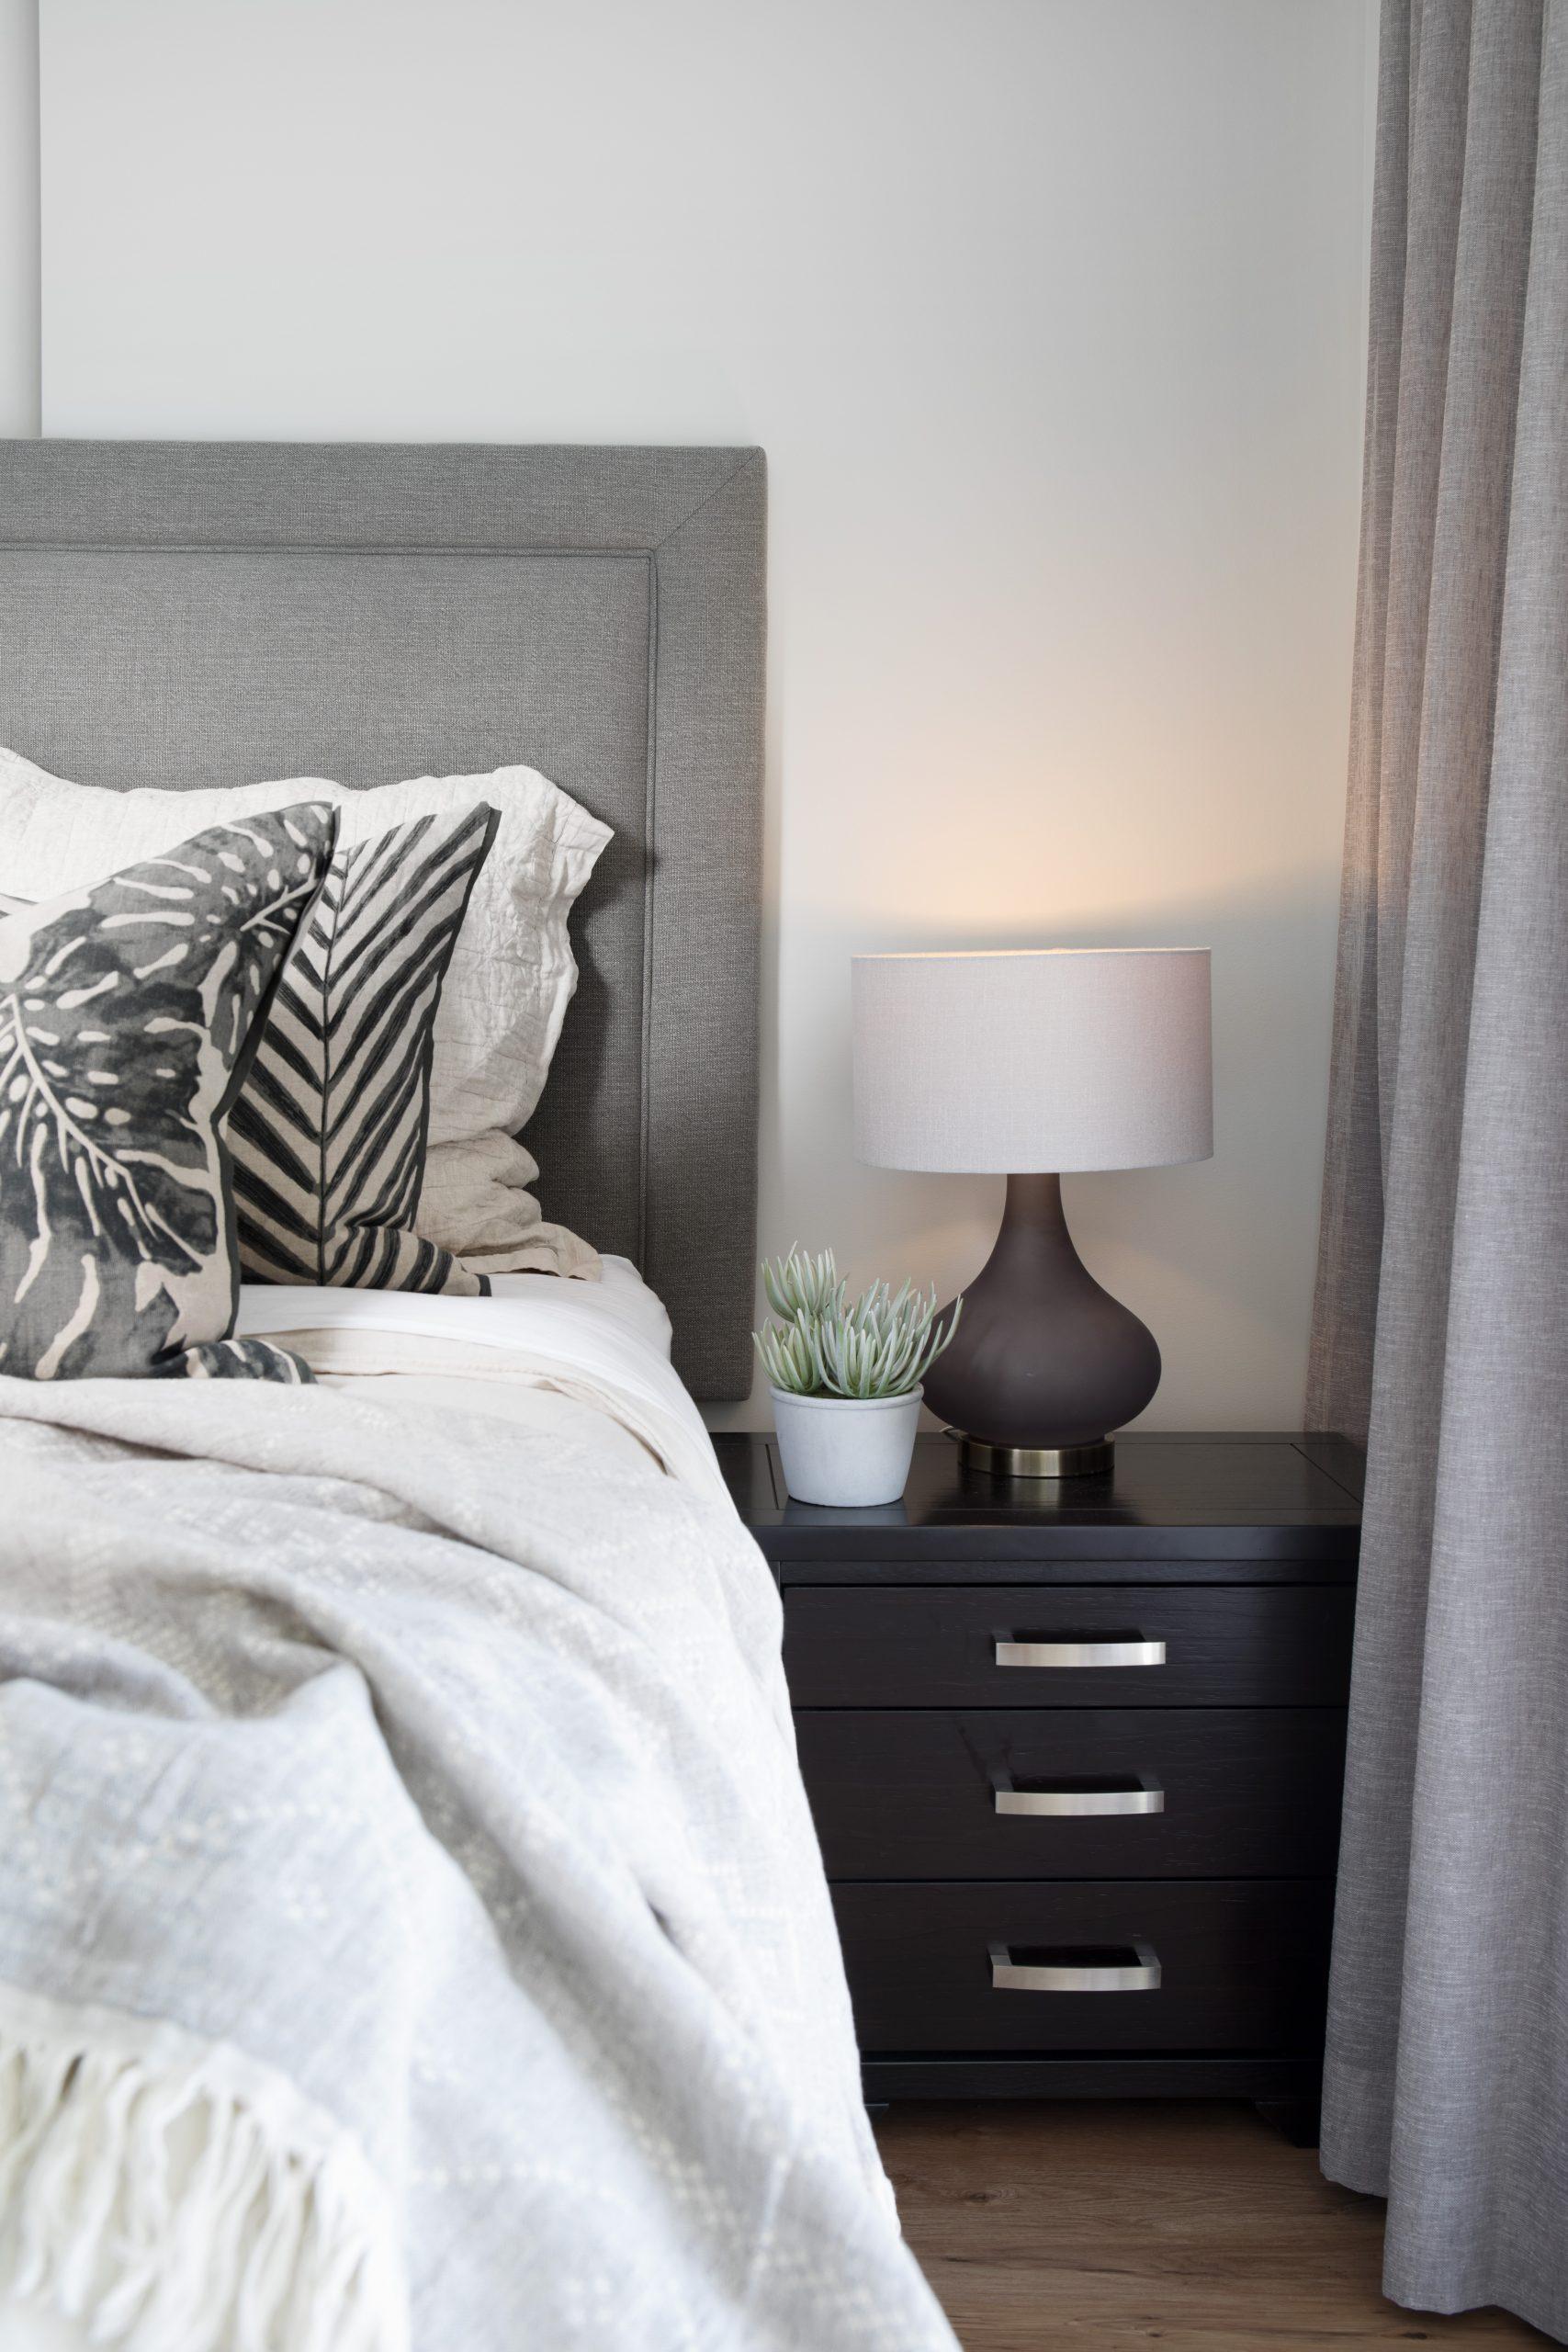 https://www.ivyandfinch.com.au/wp-content/uploads/2021/02/Roma-Street-Parklands-Interior-Design-Master-Bedroom-scaled.jpg